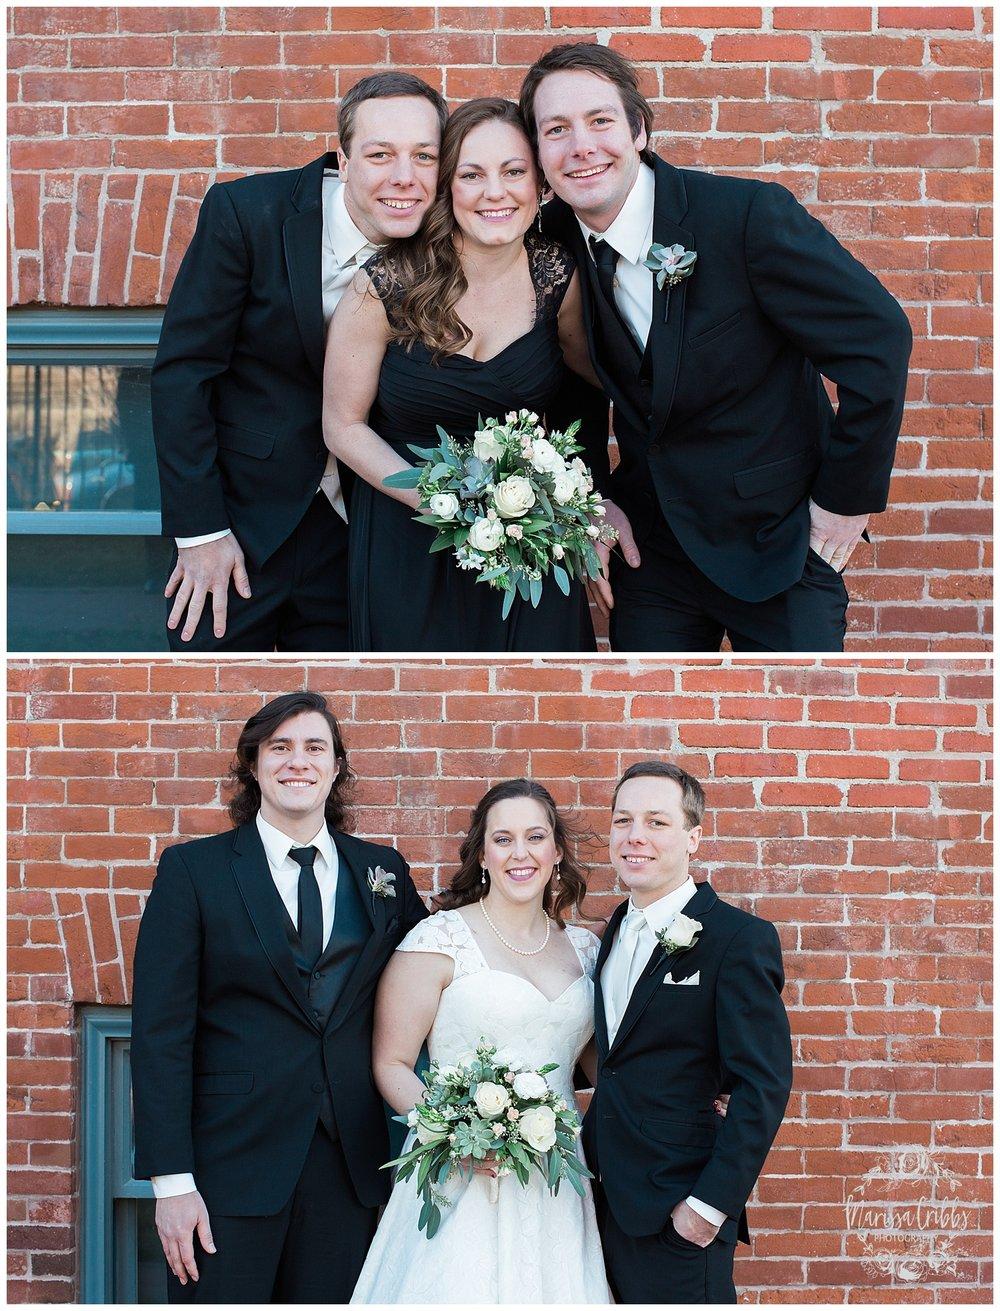 Webster House KC Wedding | KC Wedding Photographer | Marissa Cribbs Photography_0053.jpg